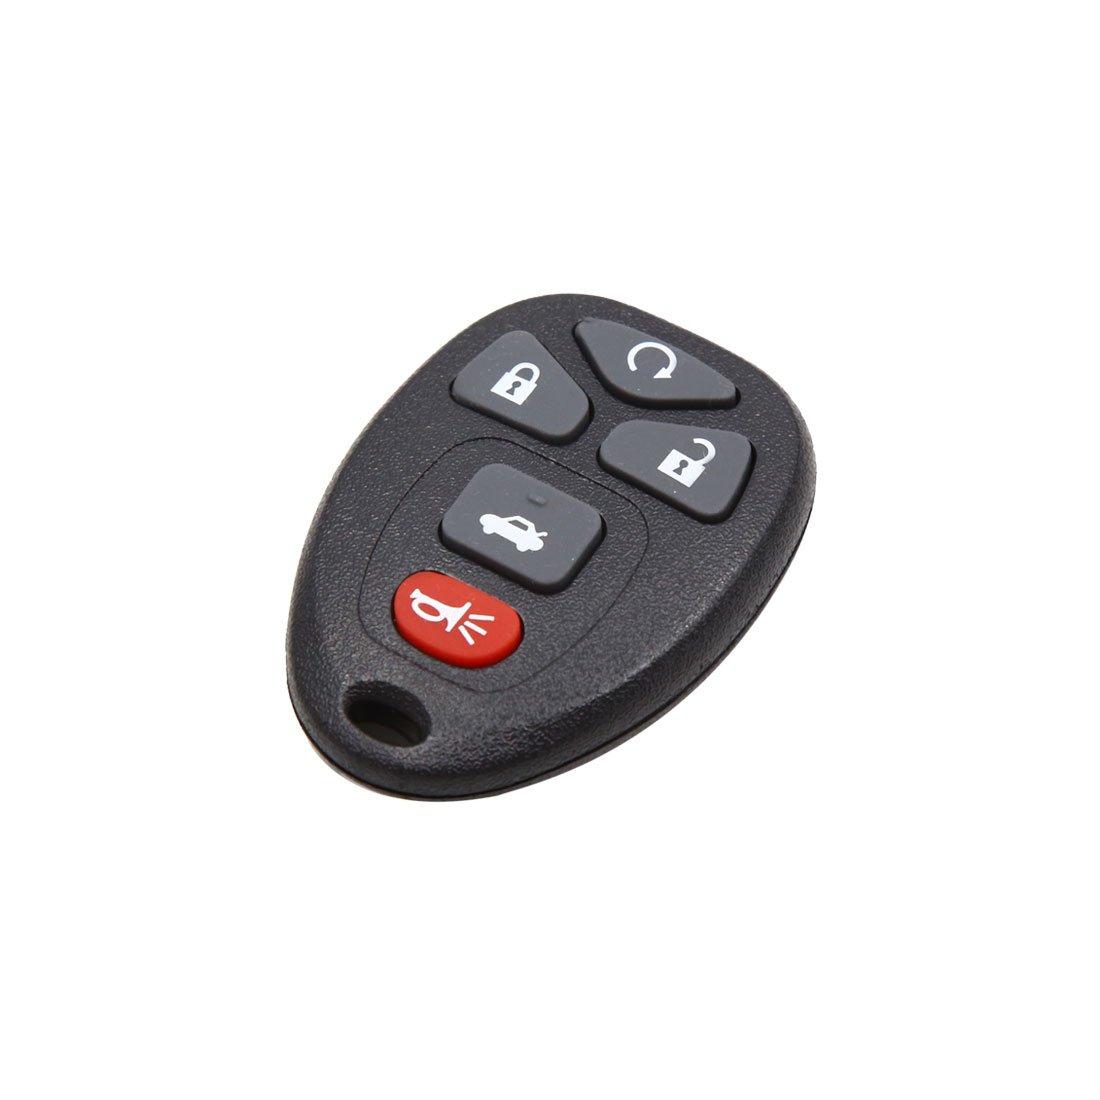 GENUINE Trim Blanking Plug Flush Sheet Plugs for Nissan Pk 50Connect 36056